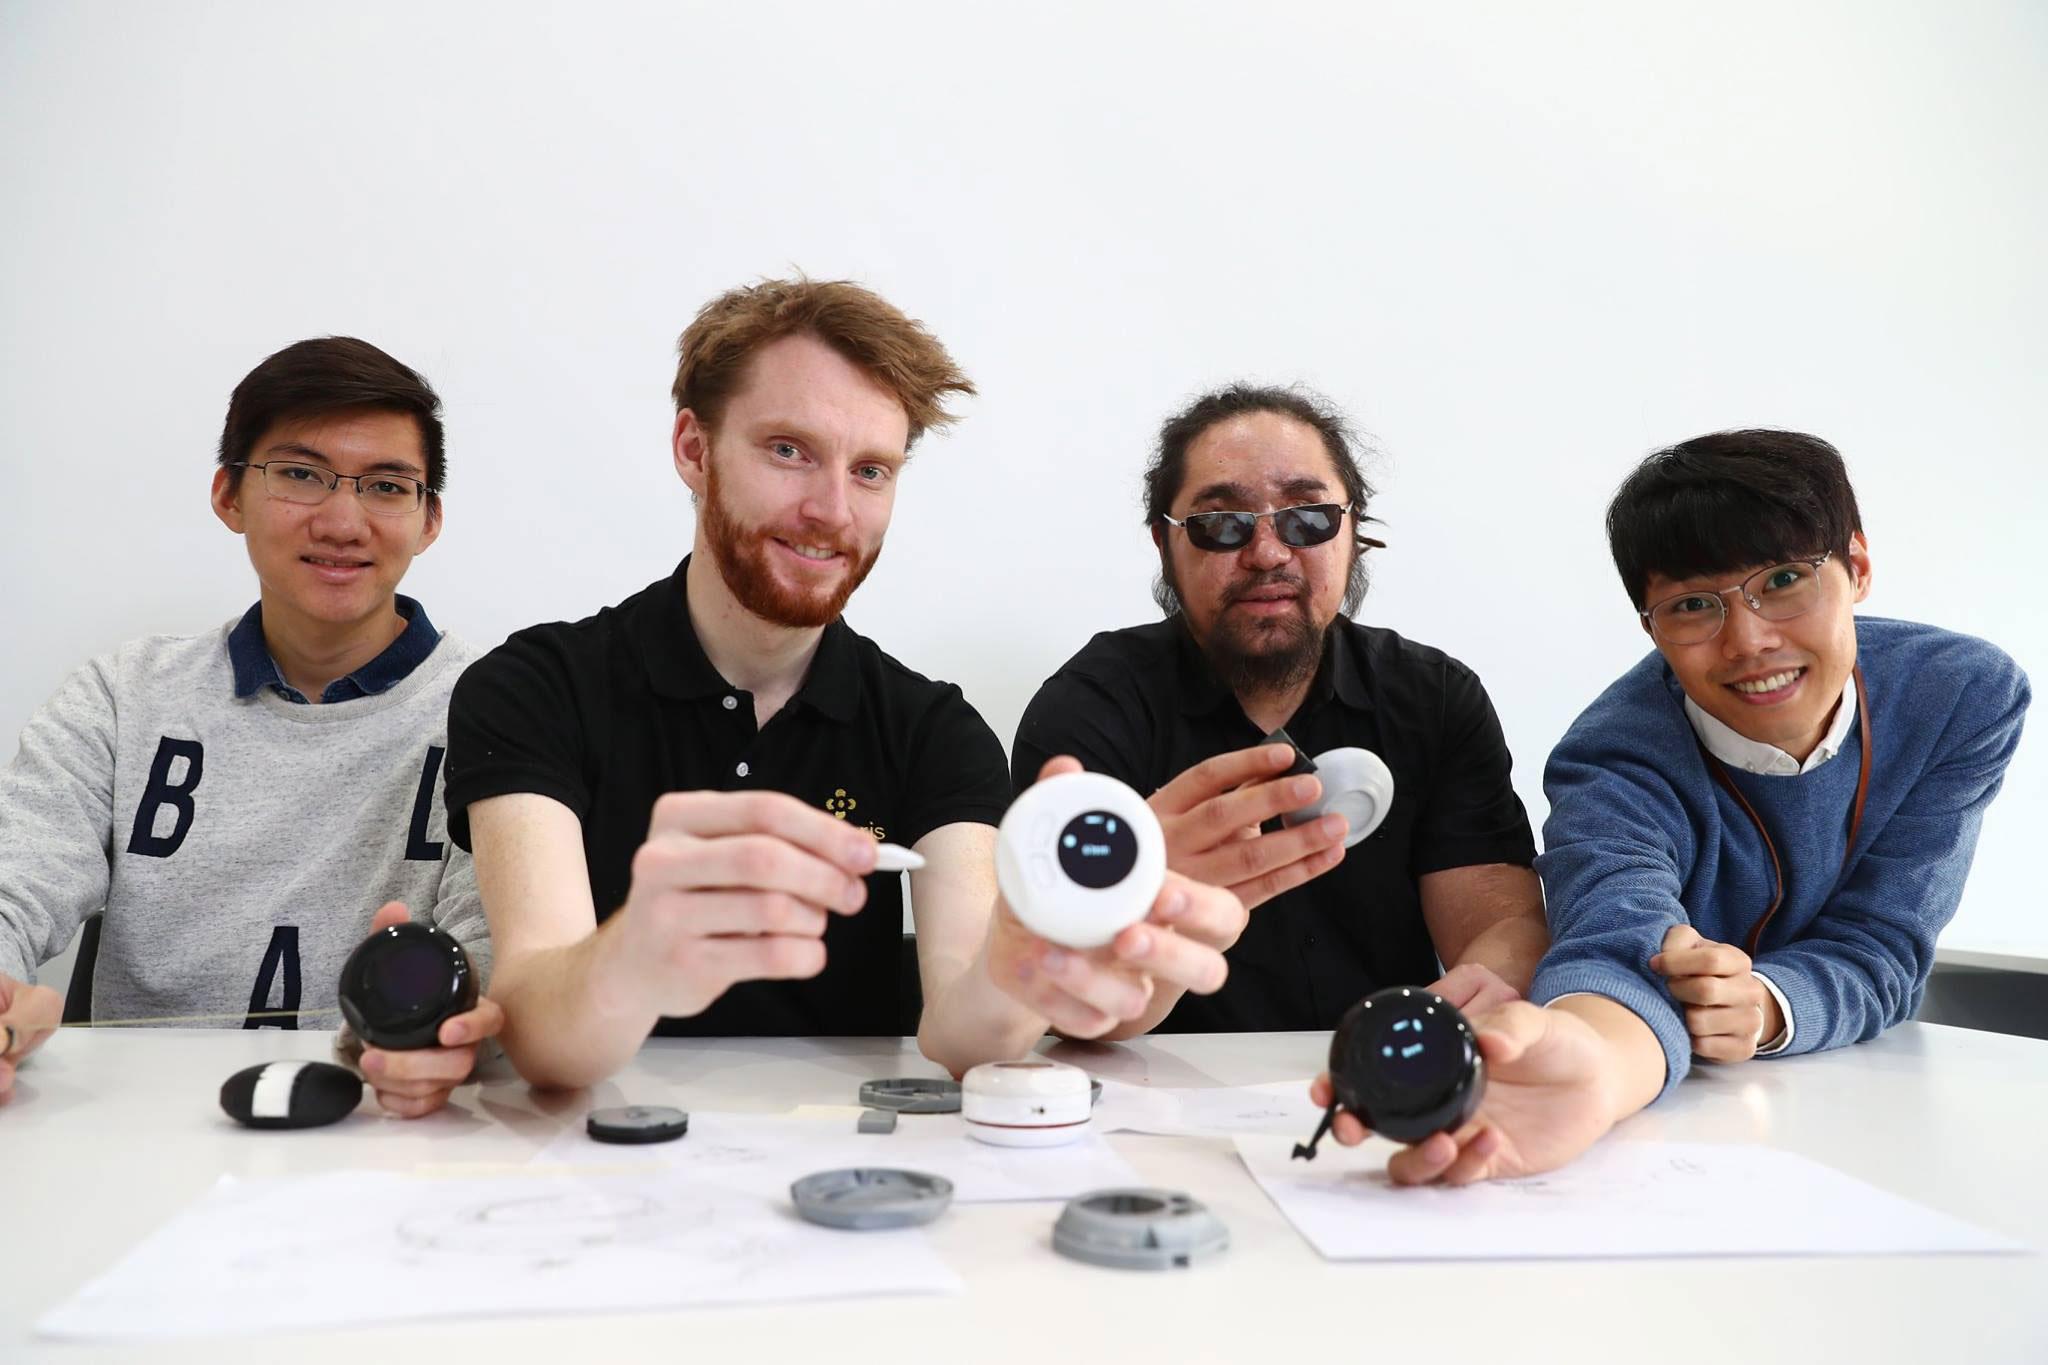 Macaron universally accessible measuring device